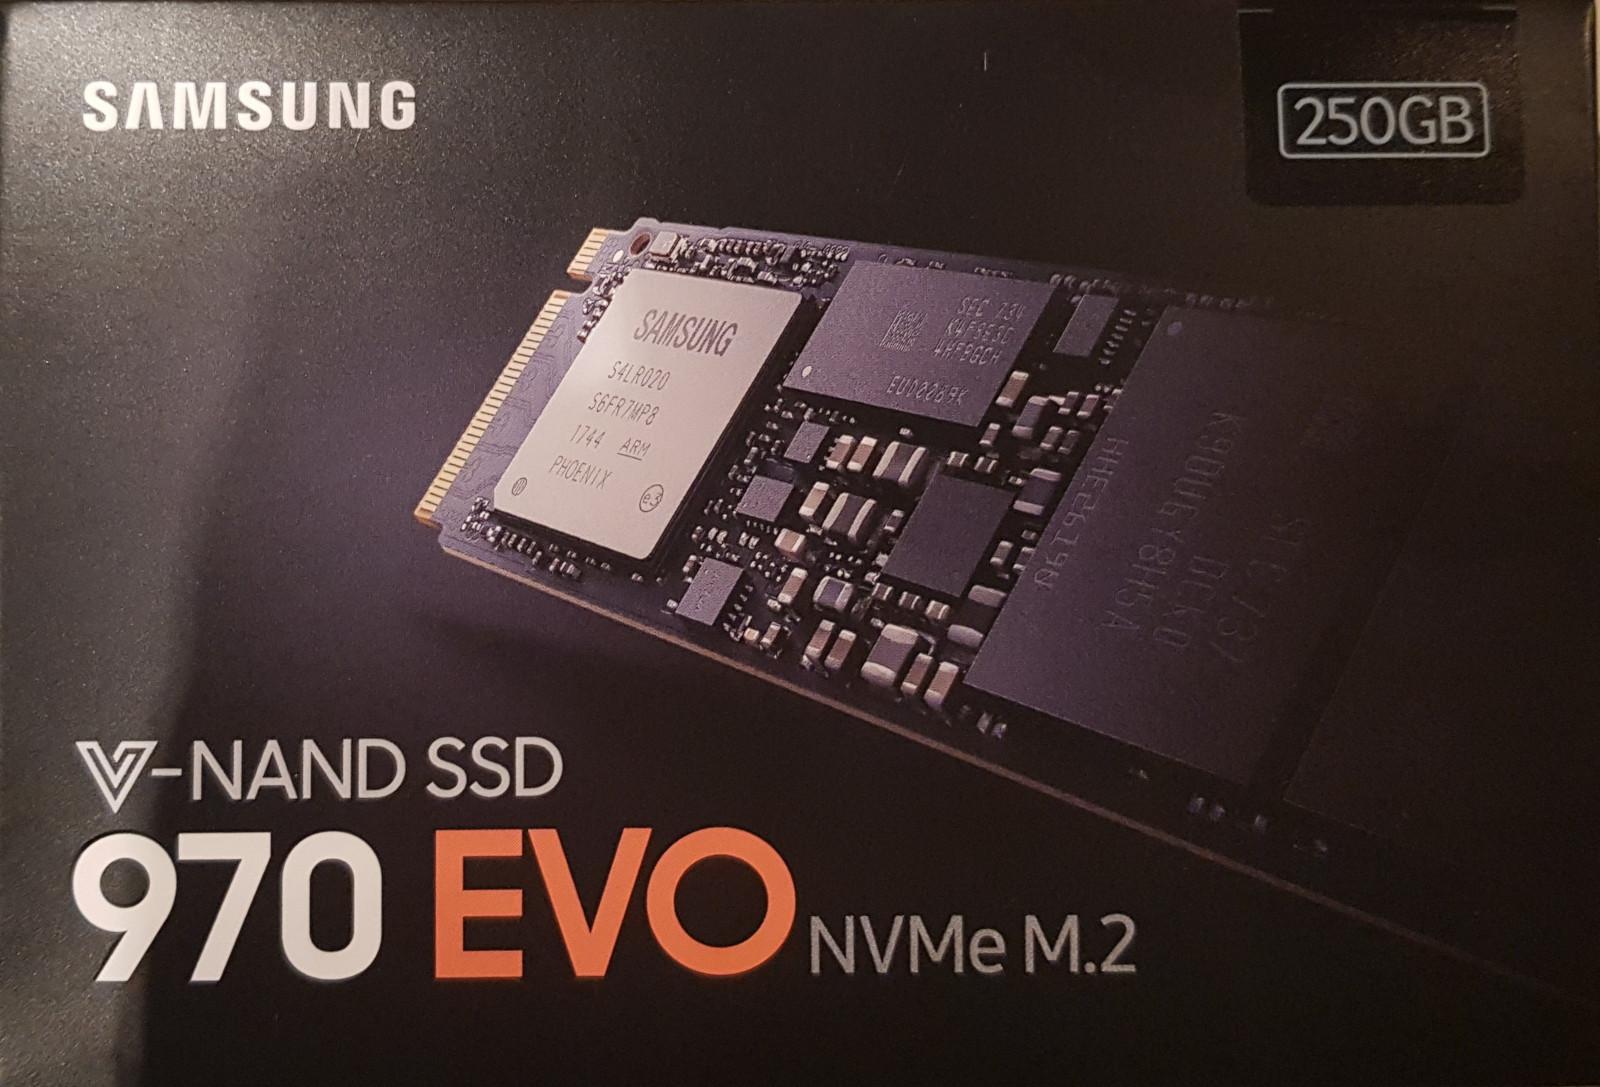 Installing ArcoLinux on Samsung 970 Evo NVMe M.2